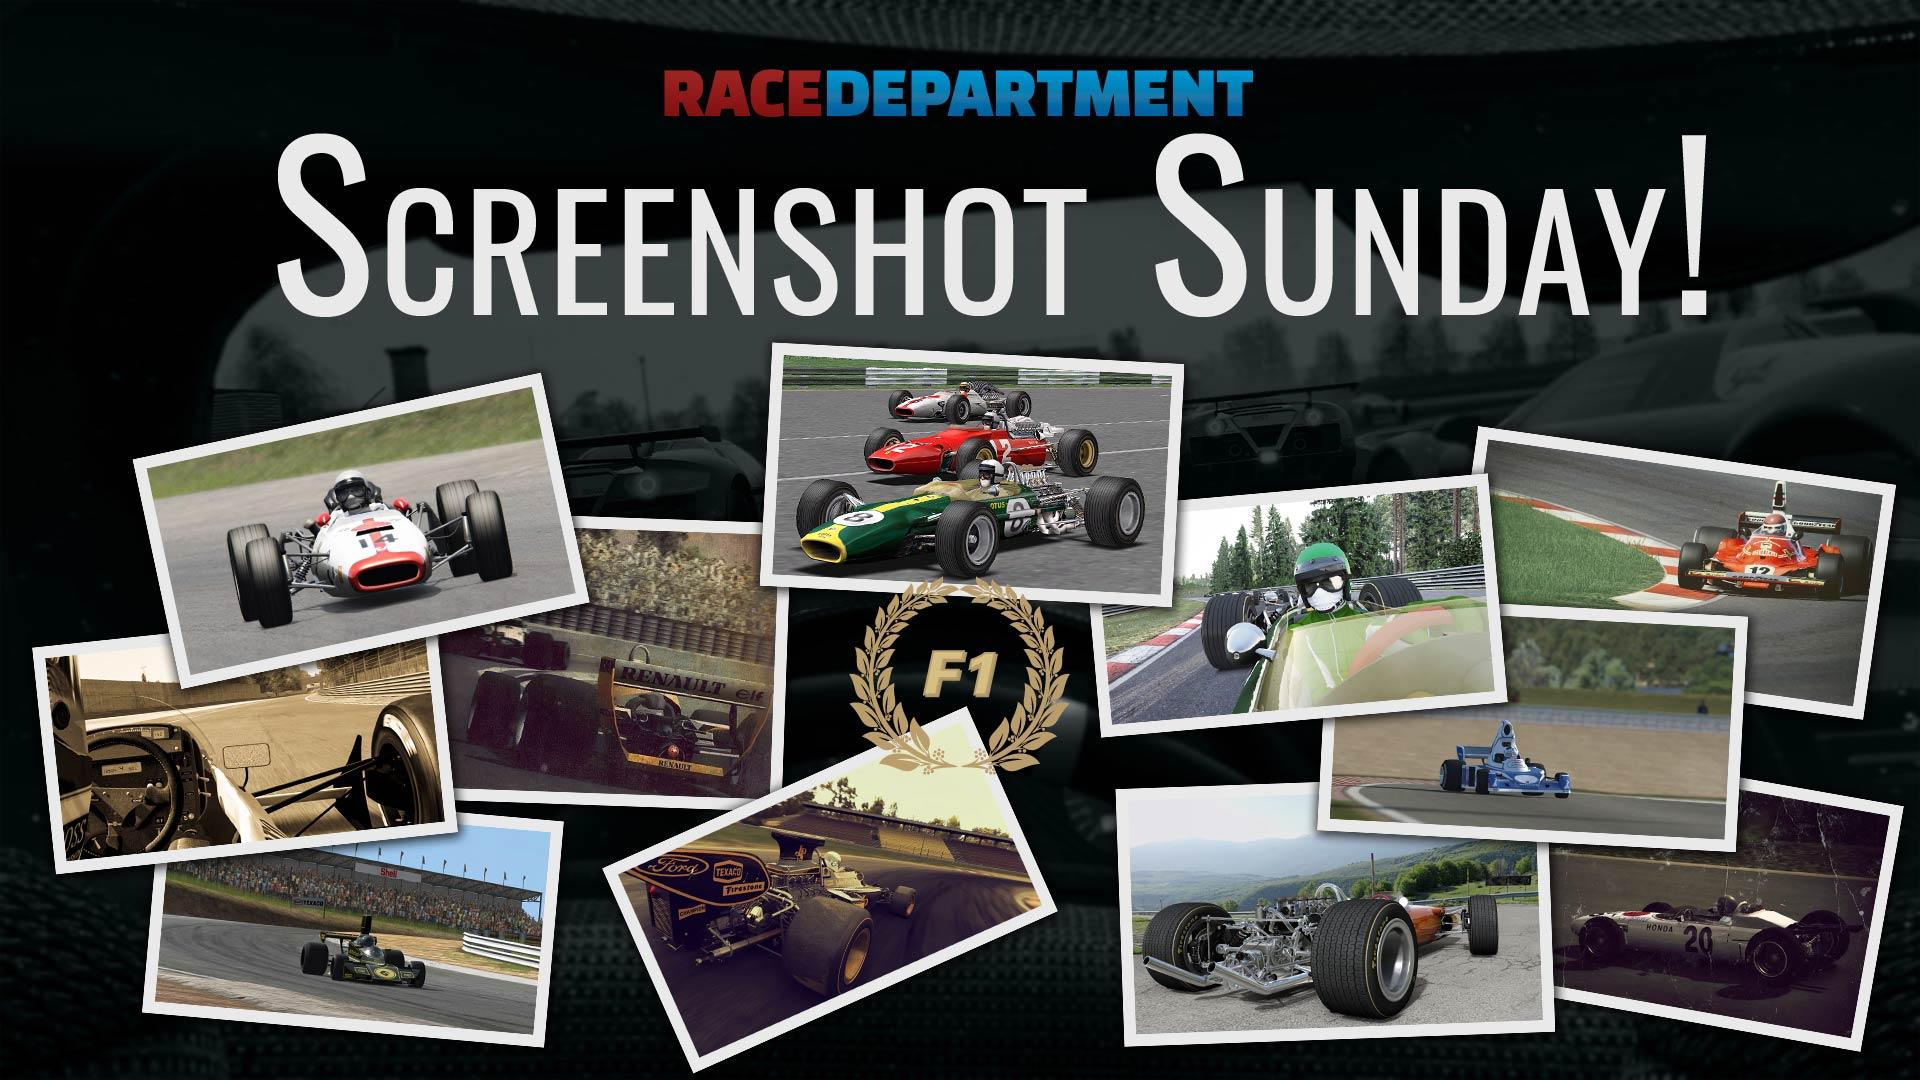 Screenshot Sunday - Classic F1.jpg